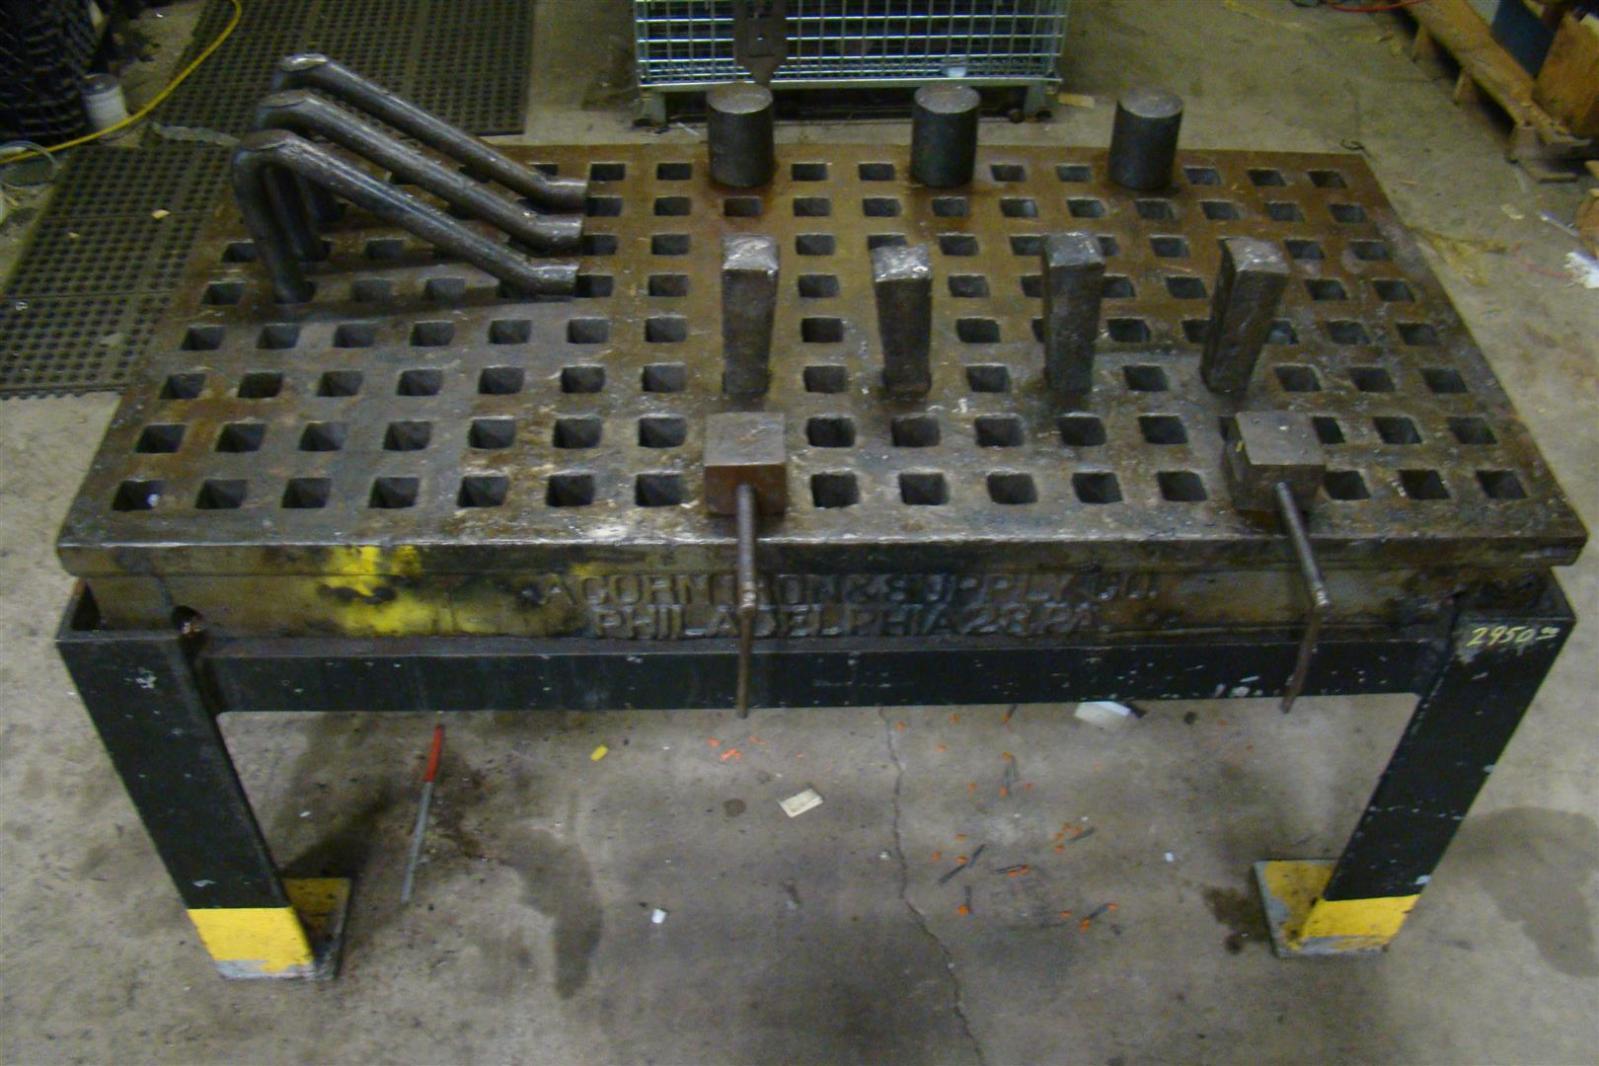 "Welding Platen Table Details about Acorn Welding Platen Layout Table 60"" x 30"" Custom Stand"